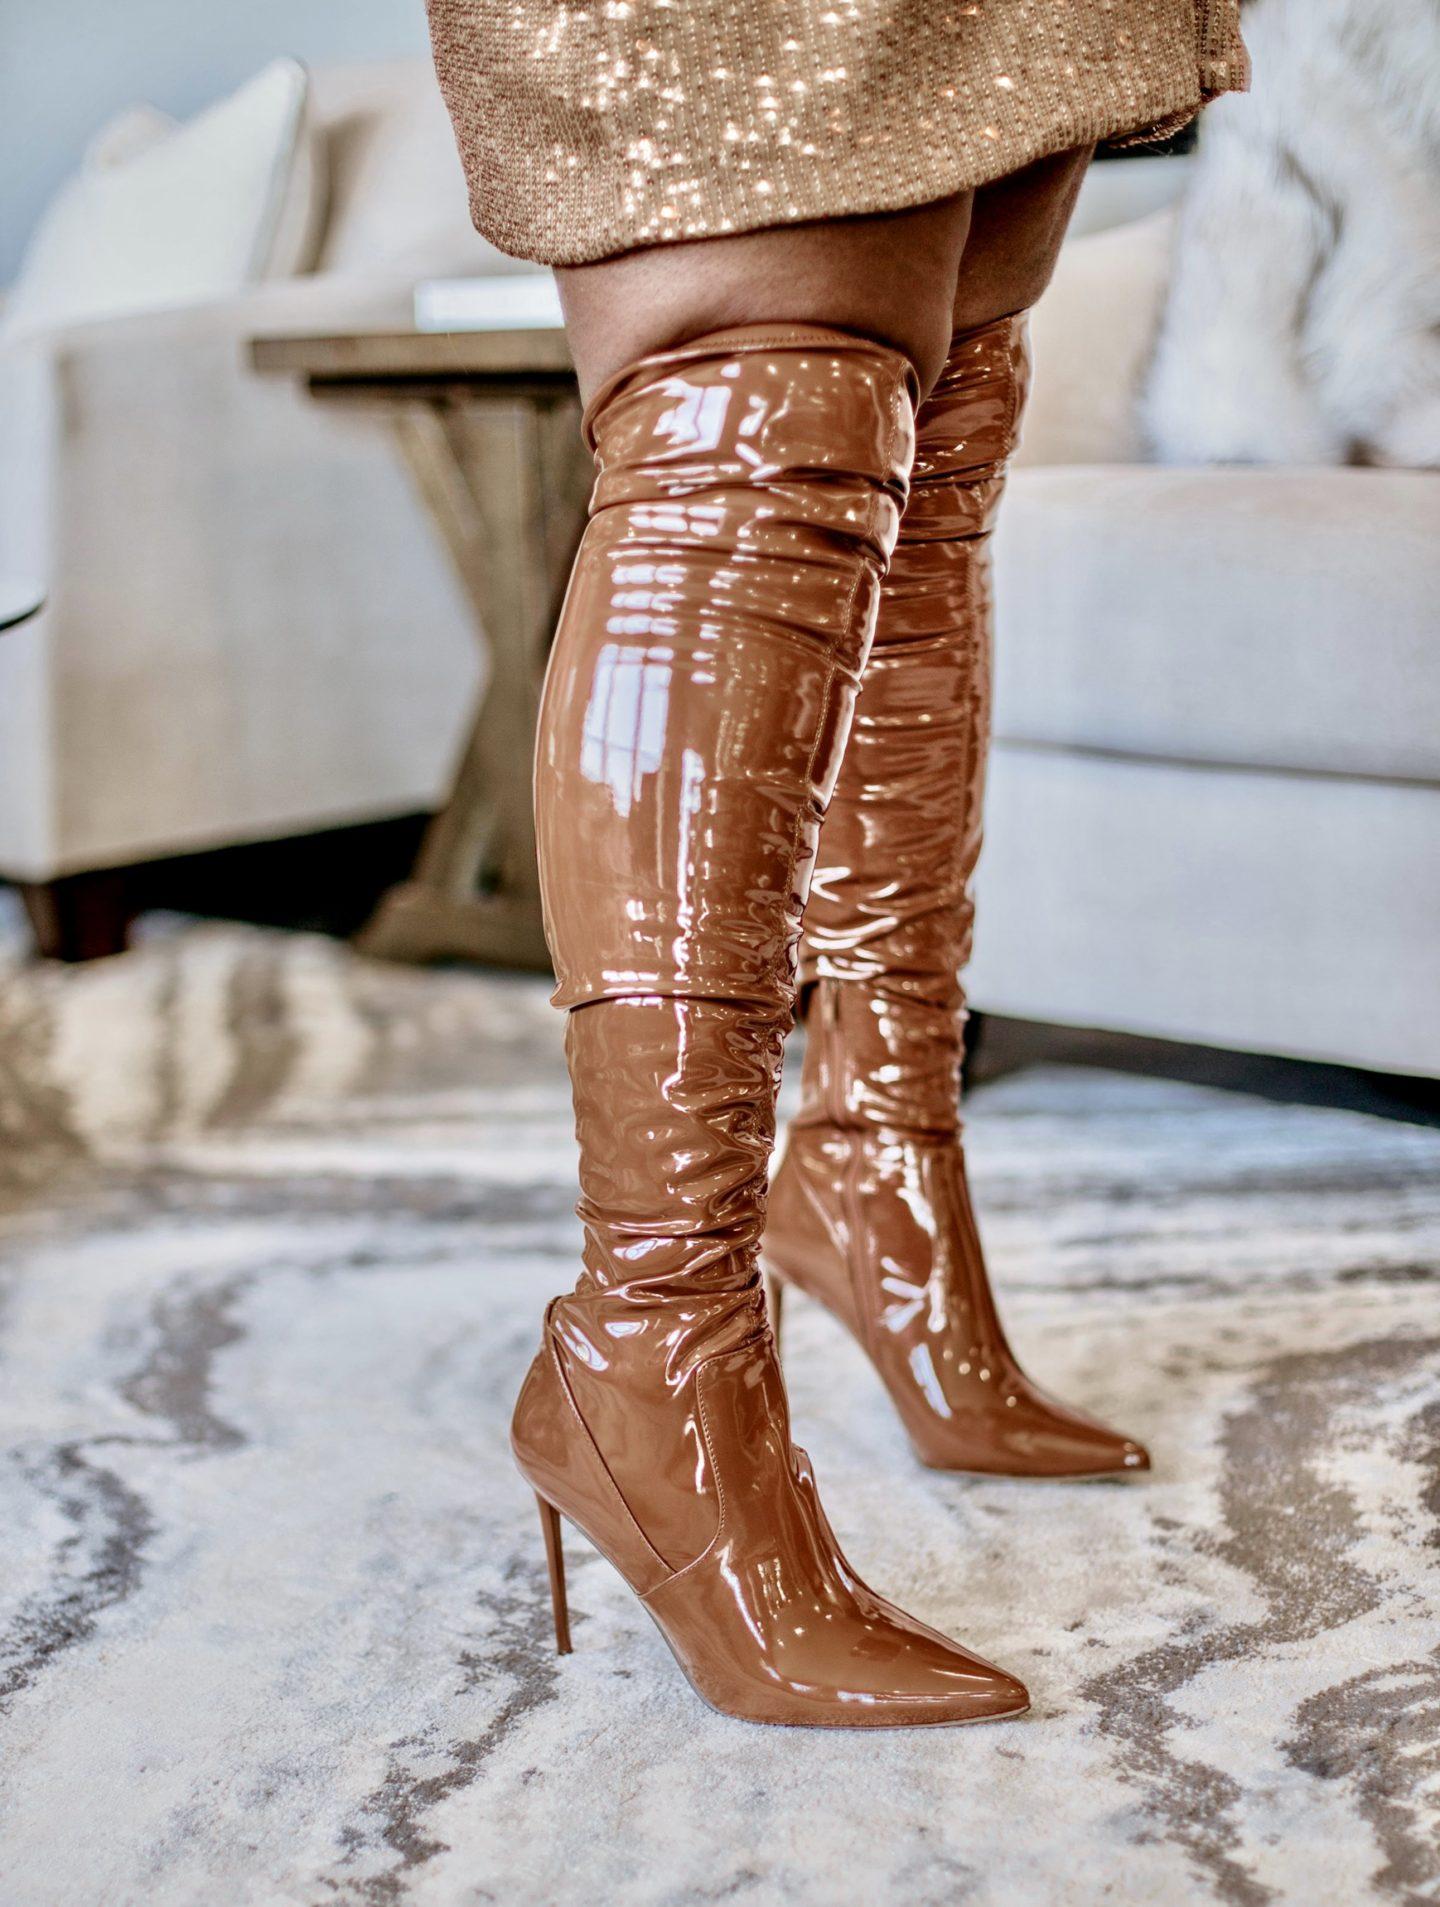 monochromatic-winter-glam-style-camel-coat-sequin-dress-steve-madden-cognac-boots